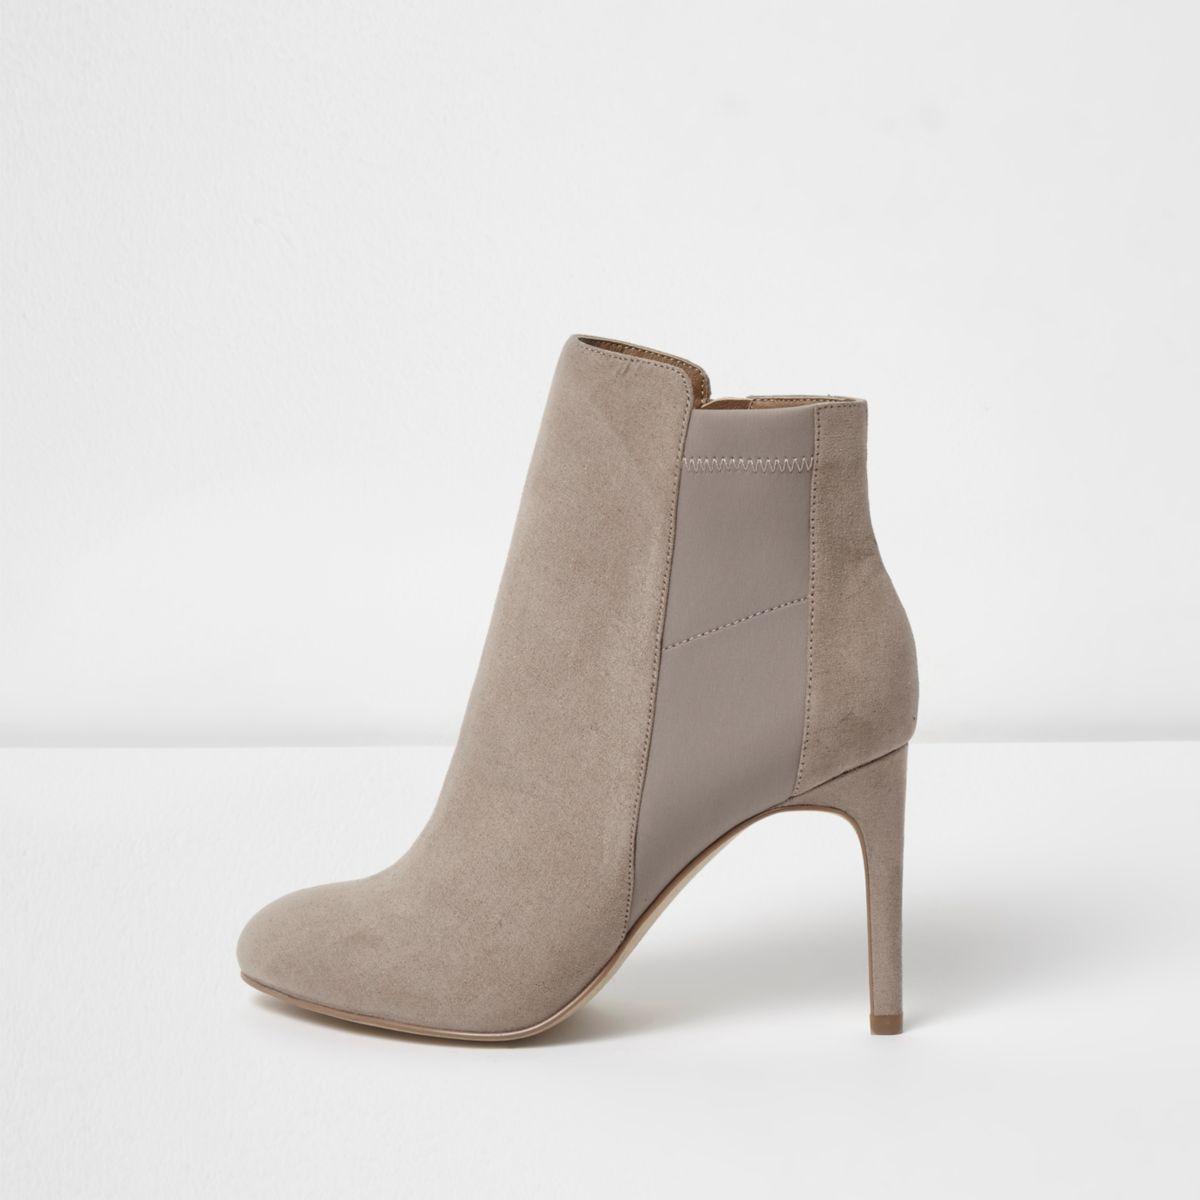 Beige scuba panel stiletto heel boots